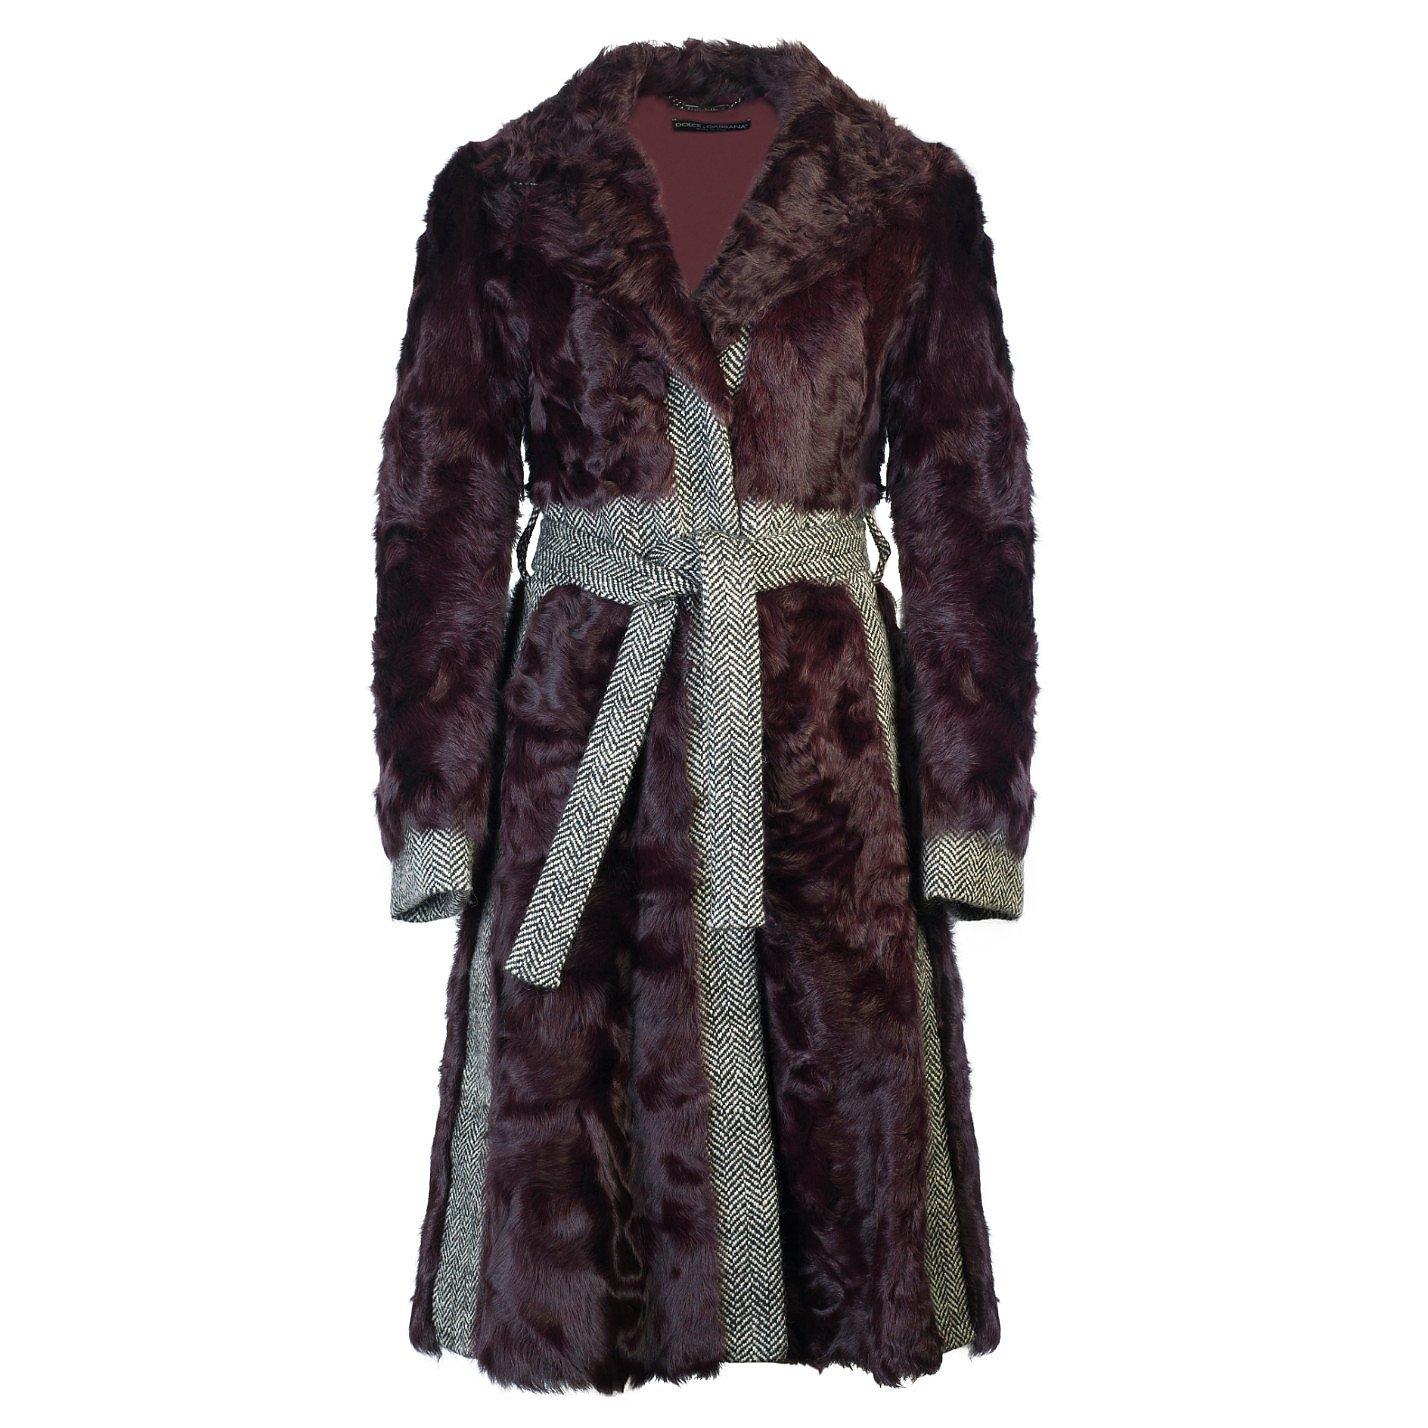 DOLCE & GABBANA Contrast-Trimmed Faux Fur Coat